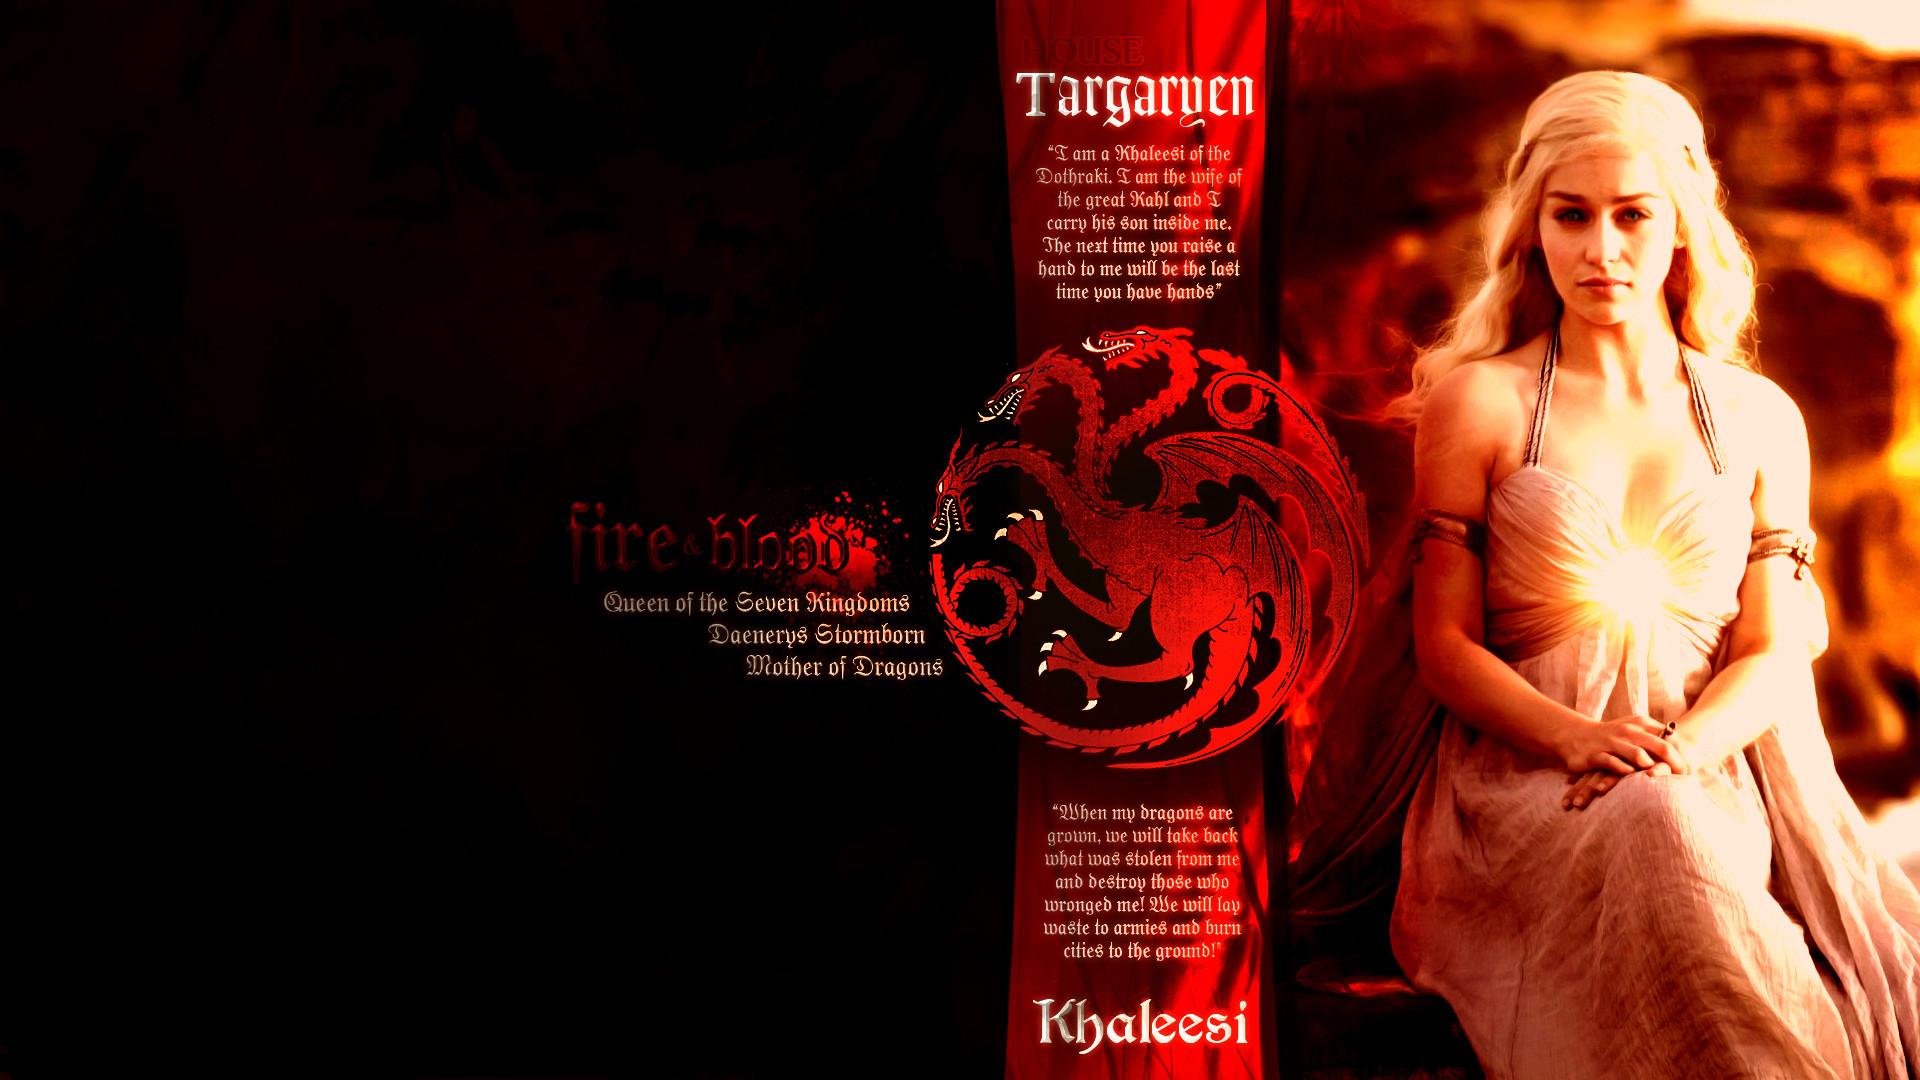 Game of Thrones House Targaryen | Game of Thrones Wallpapers House Targaryen  High Definition (HD